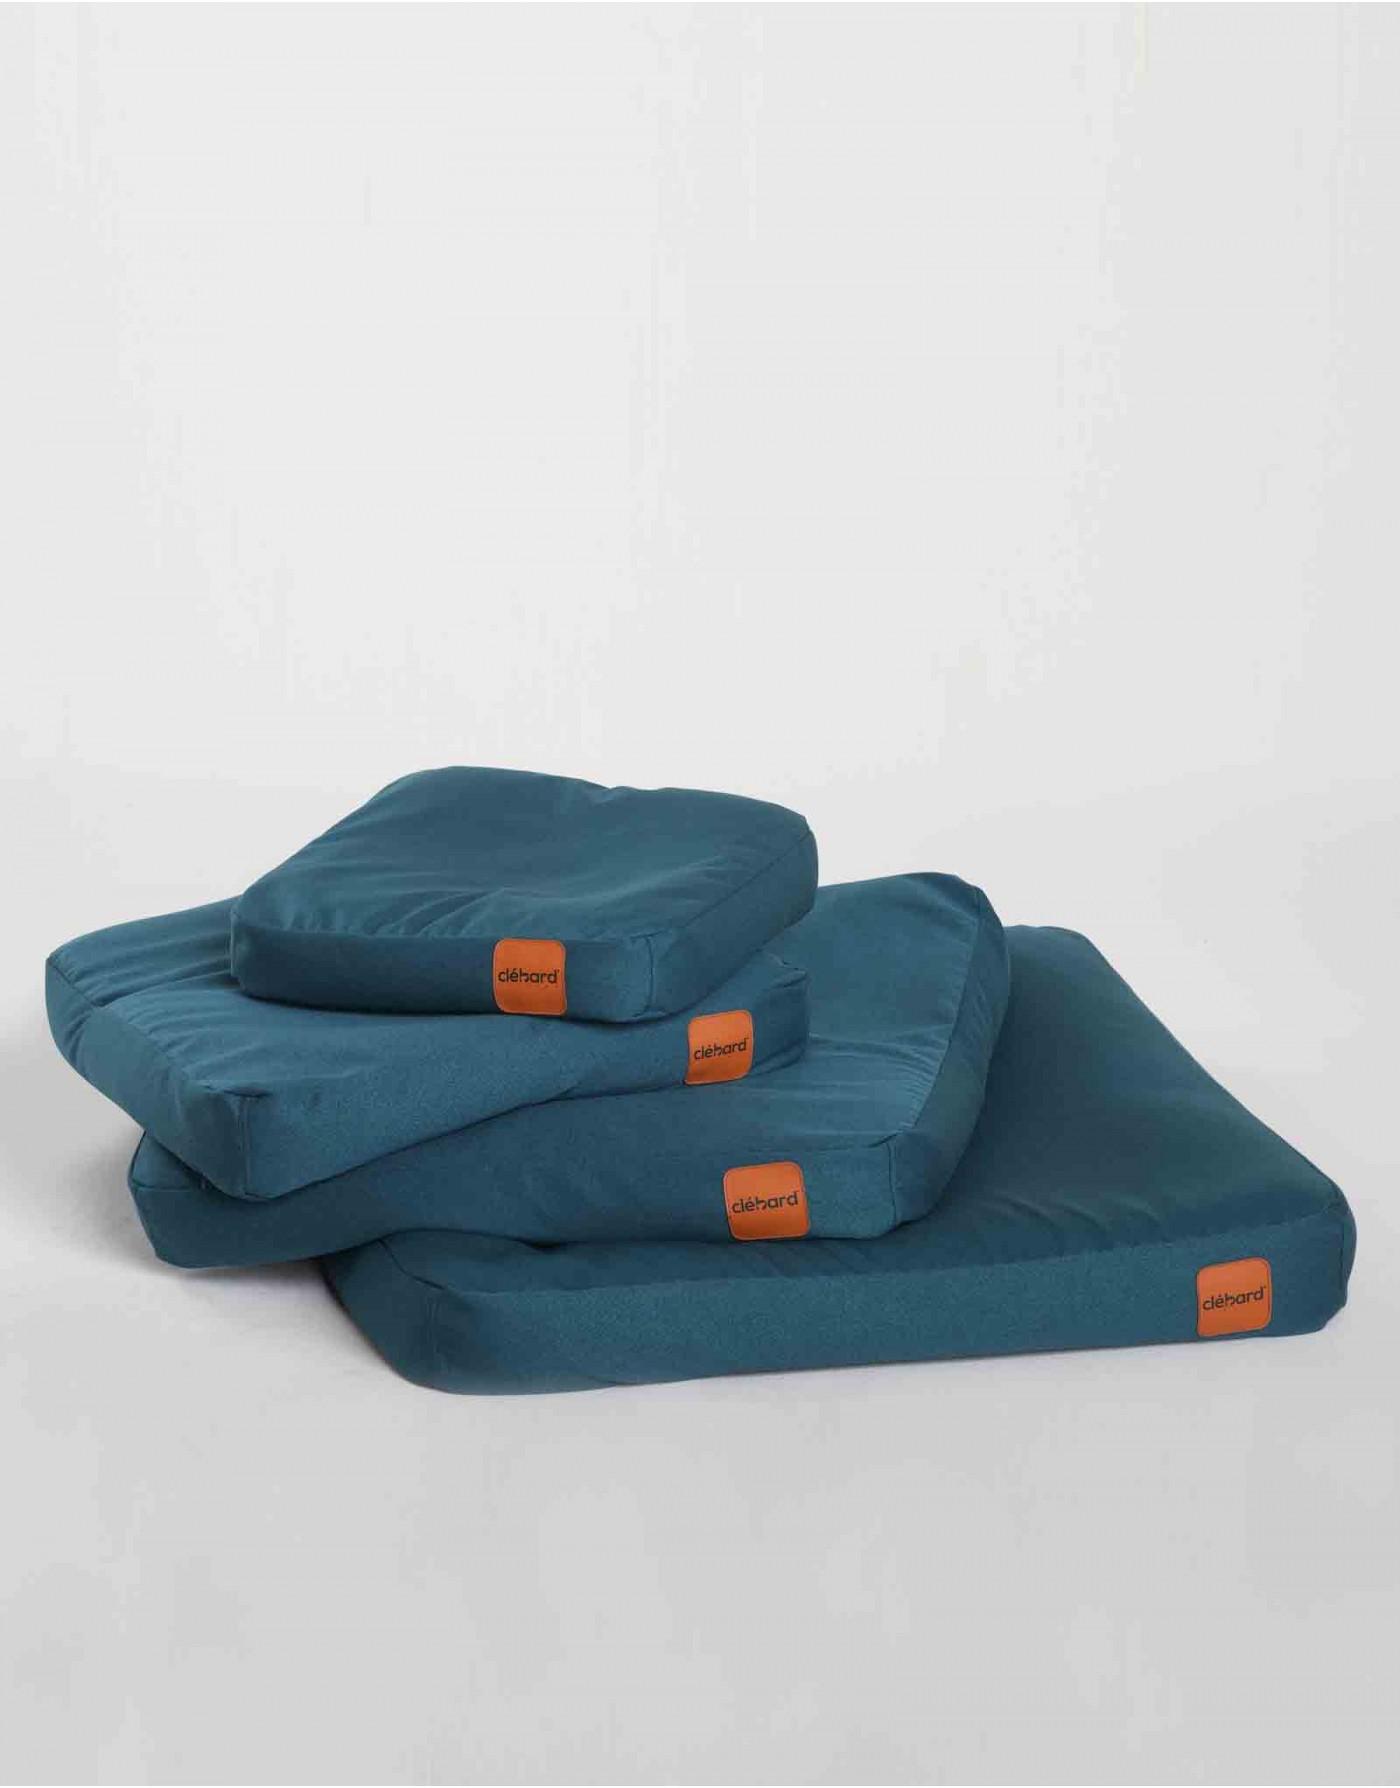 Dog's cushion design - Sofa - Peacock Blue